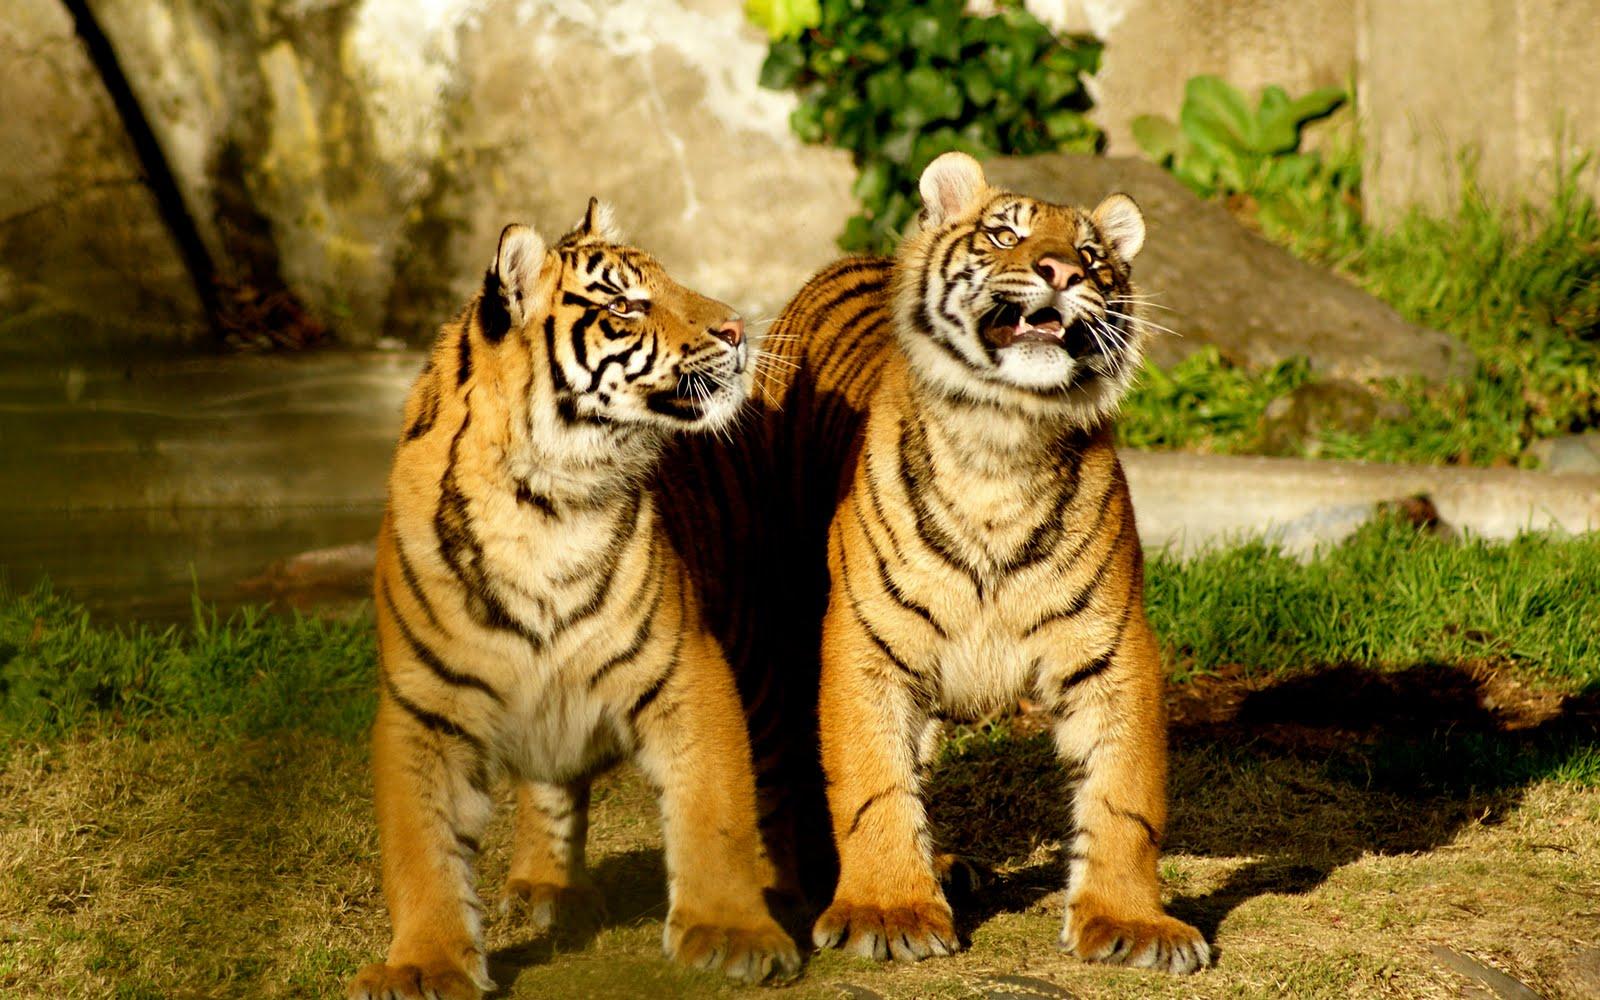 http://2.bp.blogspot.com/_EZ16vWYvHHg/S2MsSunudXI/AAAAAAAAHvk/rx0uf0eynR8/s1600/Tigres-3.jpg